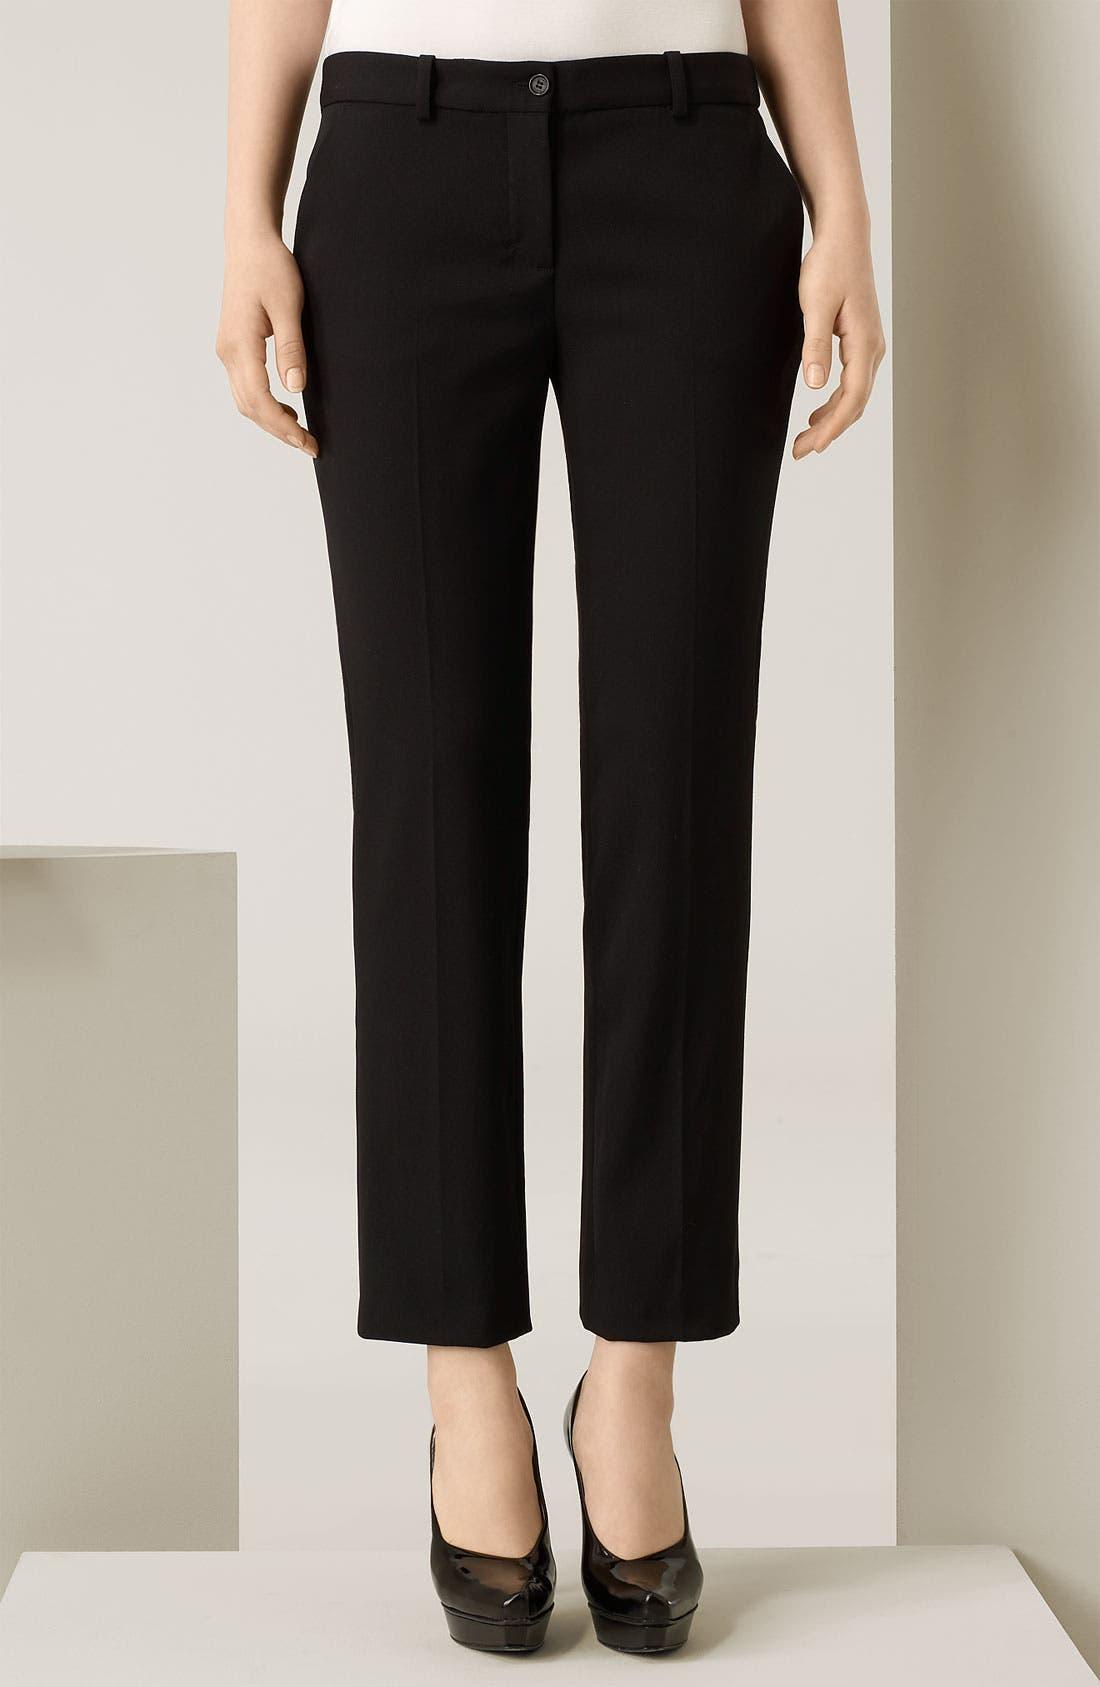 Main Image - Michael Kors Cotton Broadcloth Capri Pants